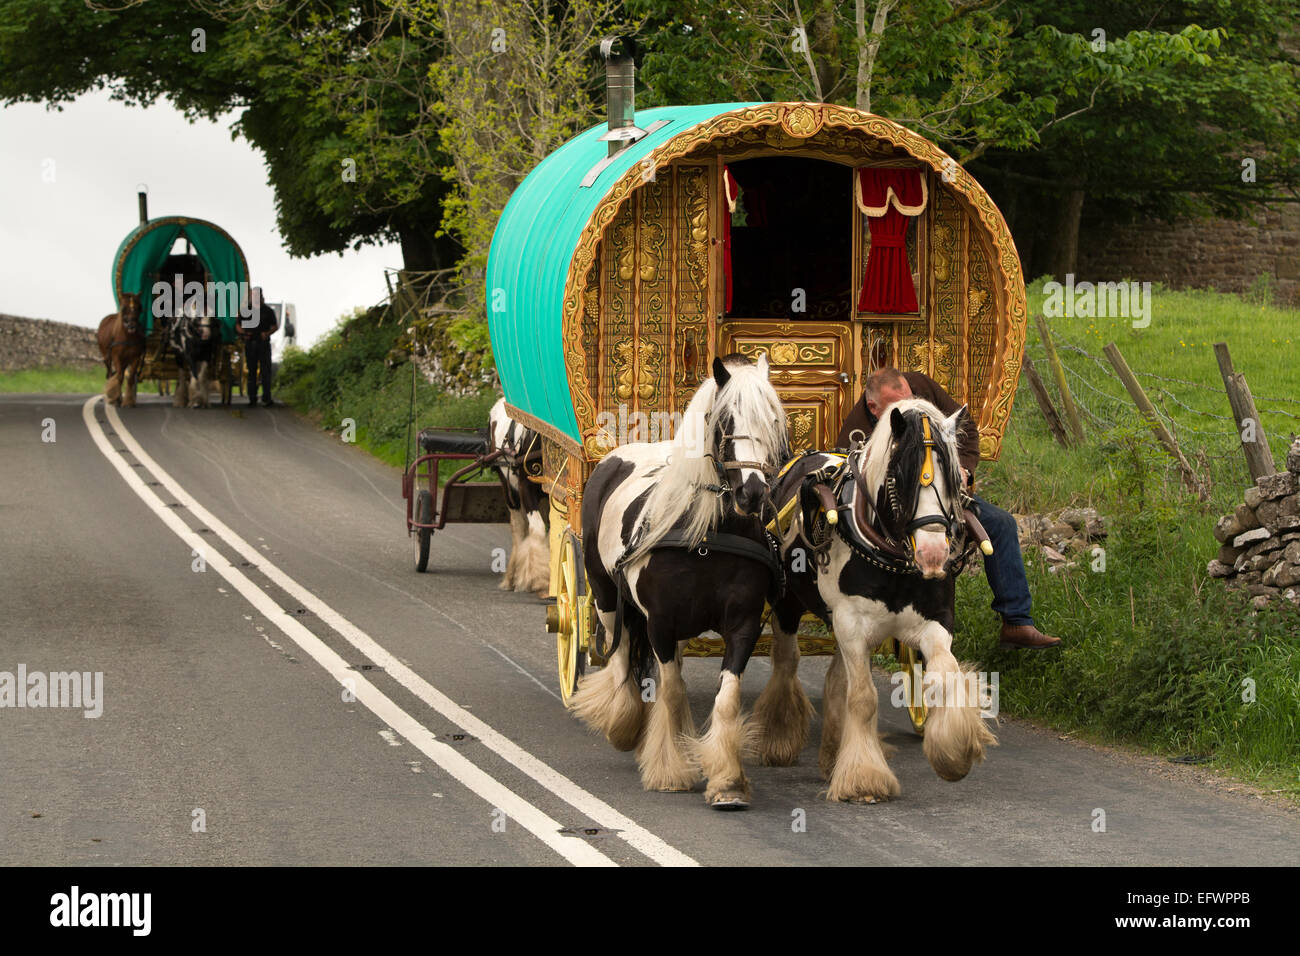 Traditional gypsy horse drawn caravan on road heading towards Appleby Horse Fair, Cumbria. - Stock Image